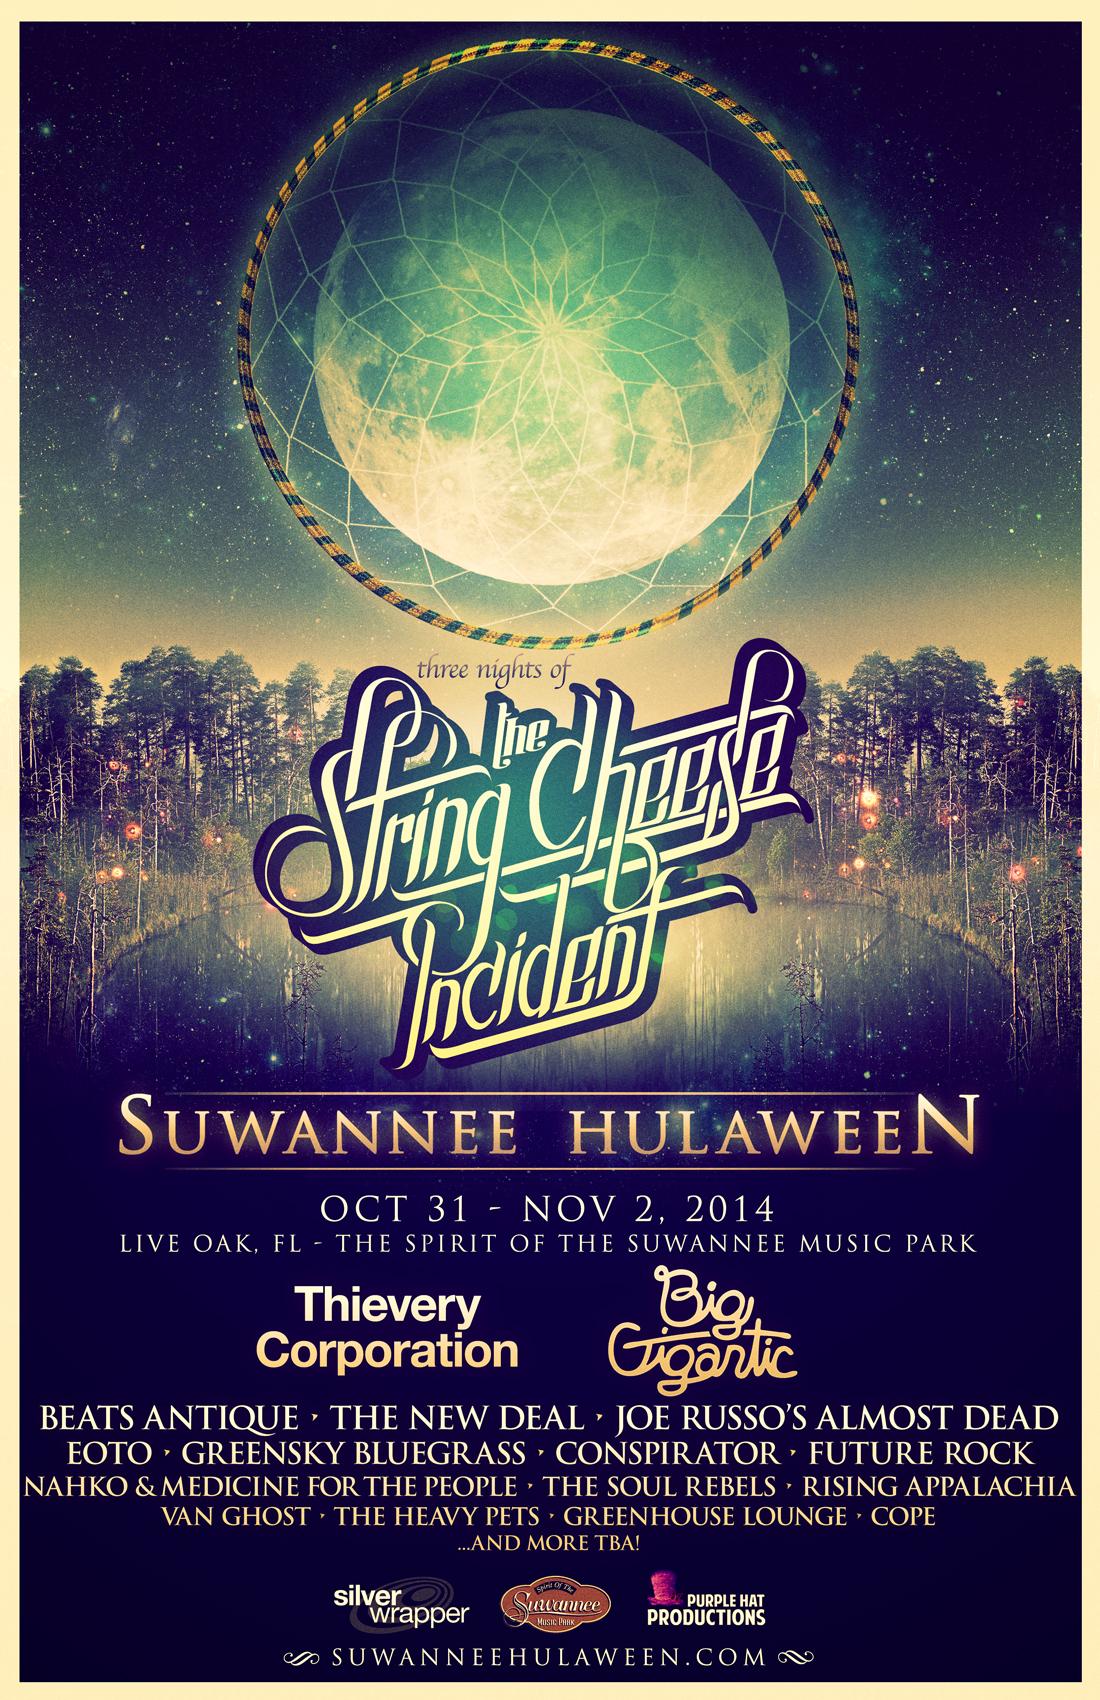 Suwannee Hulaween 2014 Wave 1 Poster 11x17